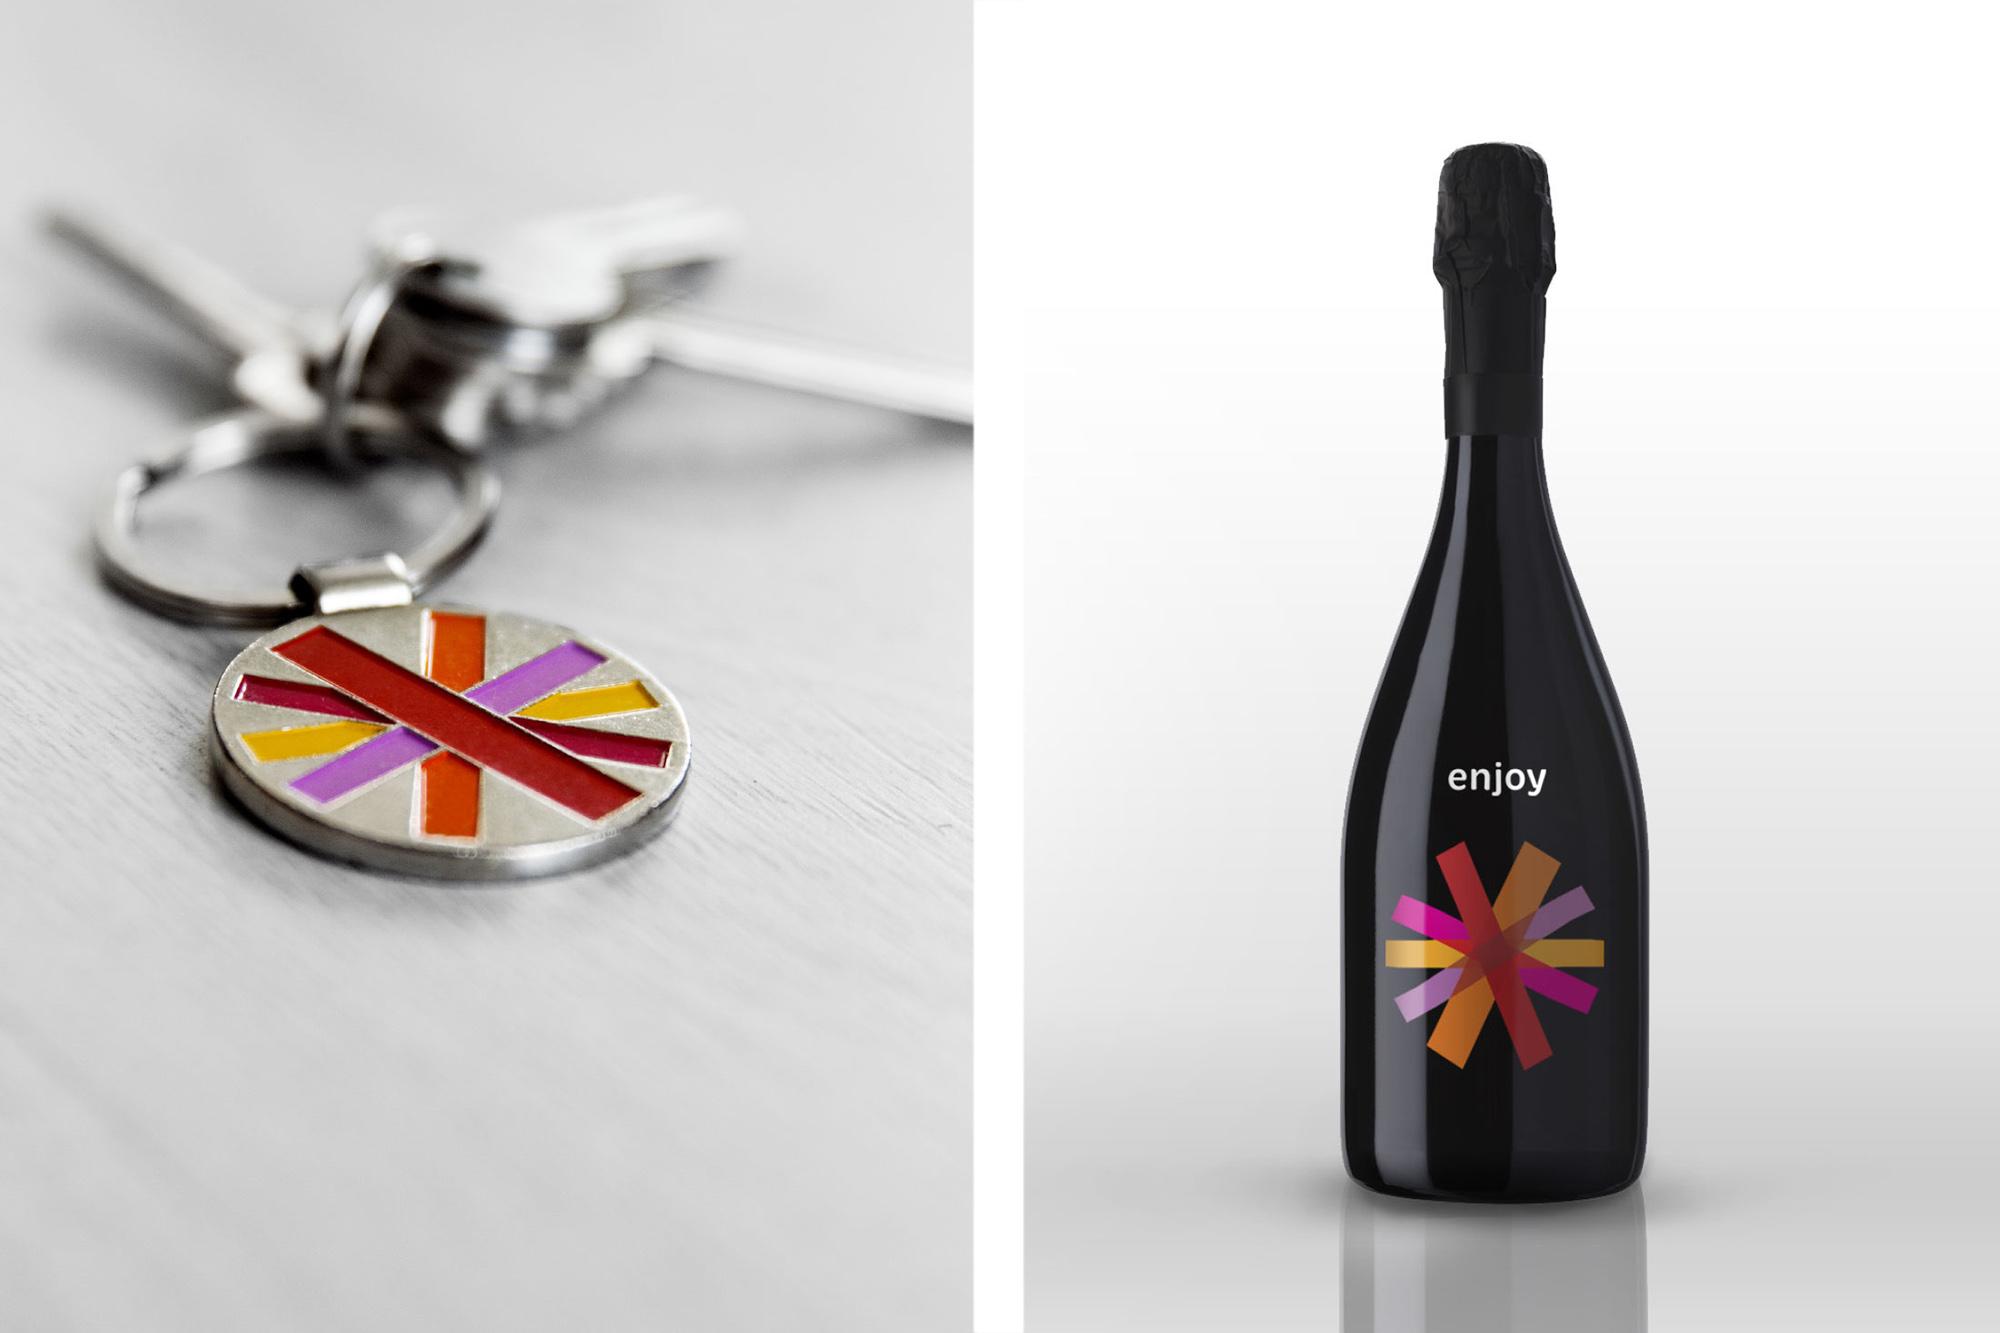 bourkes-keyrings-wine